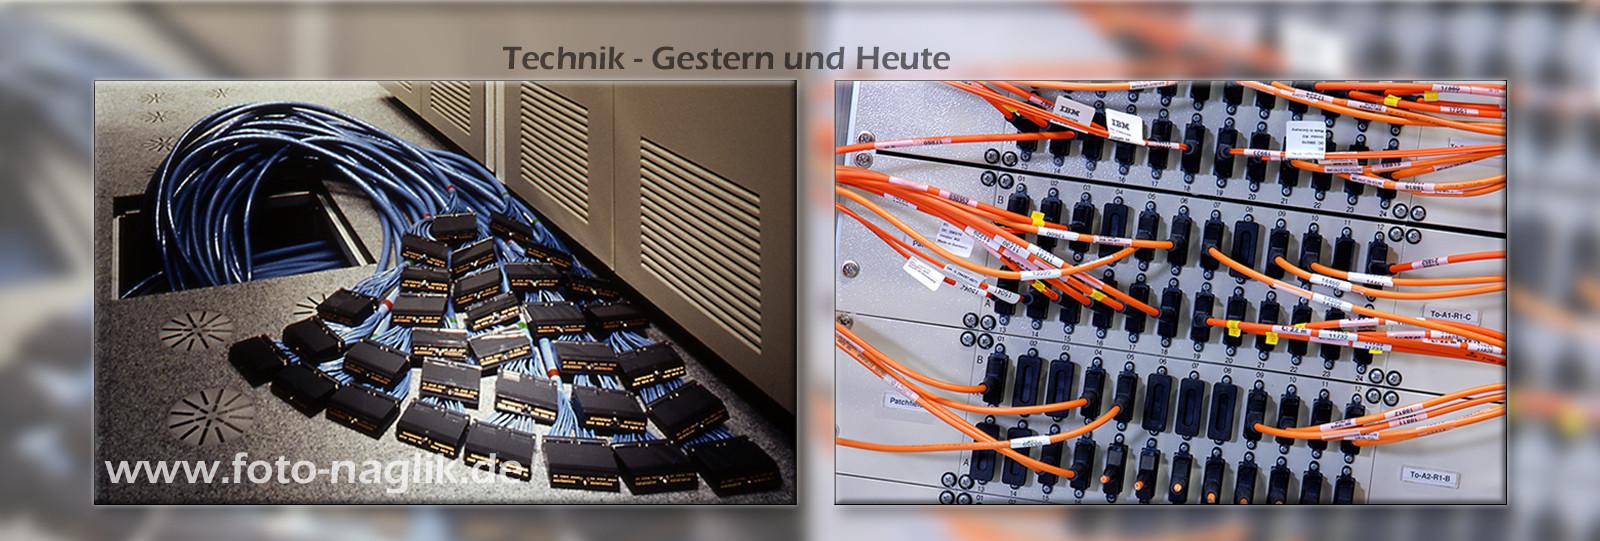 Naglik-Foto-Erding-Amadeus-Computer-Technik02